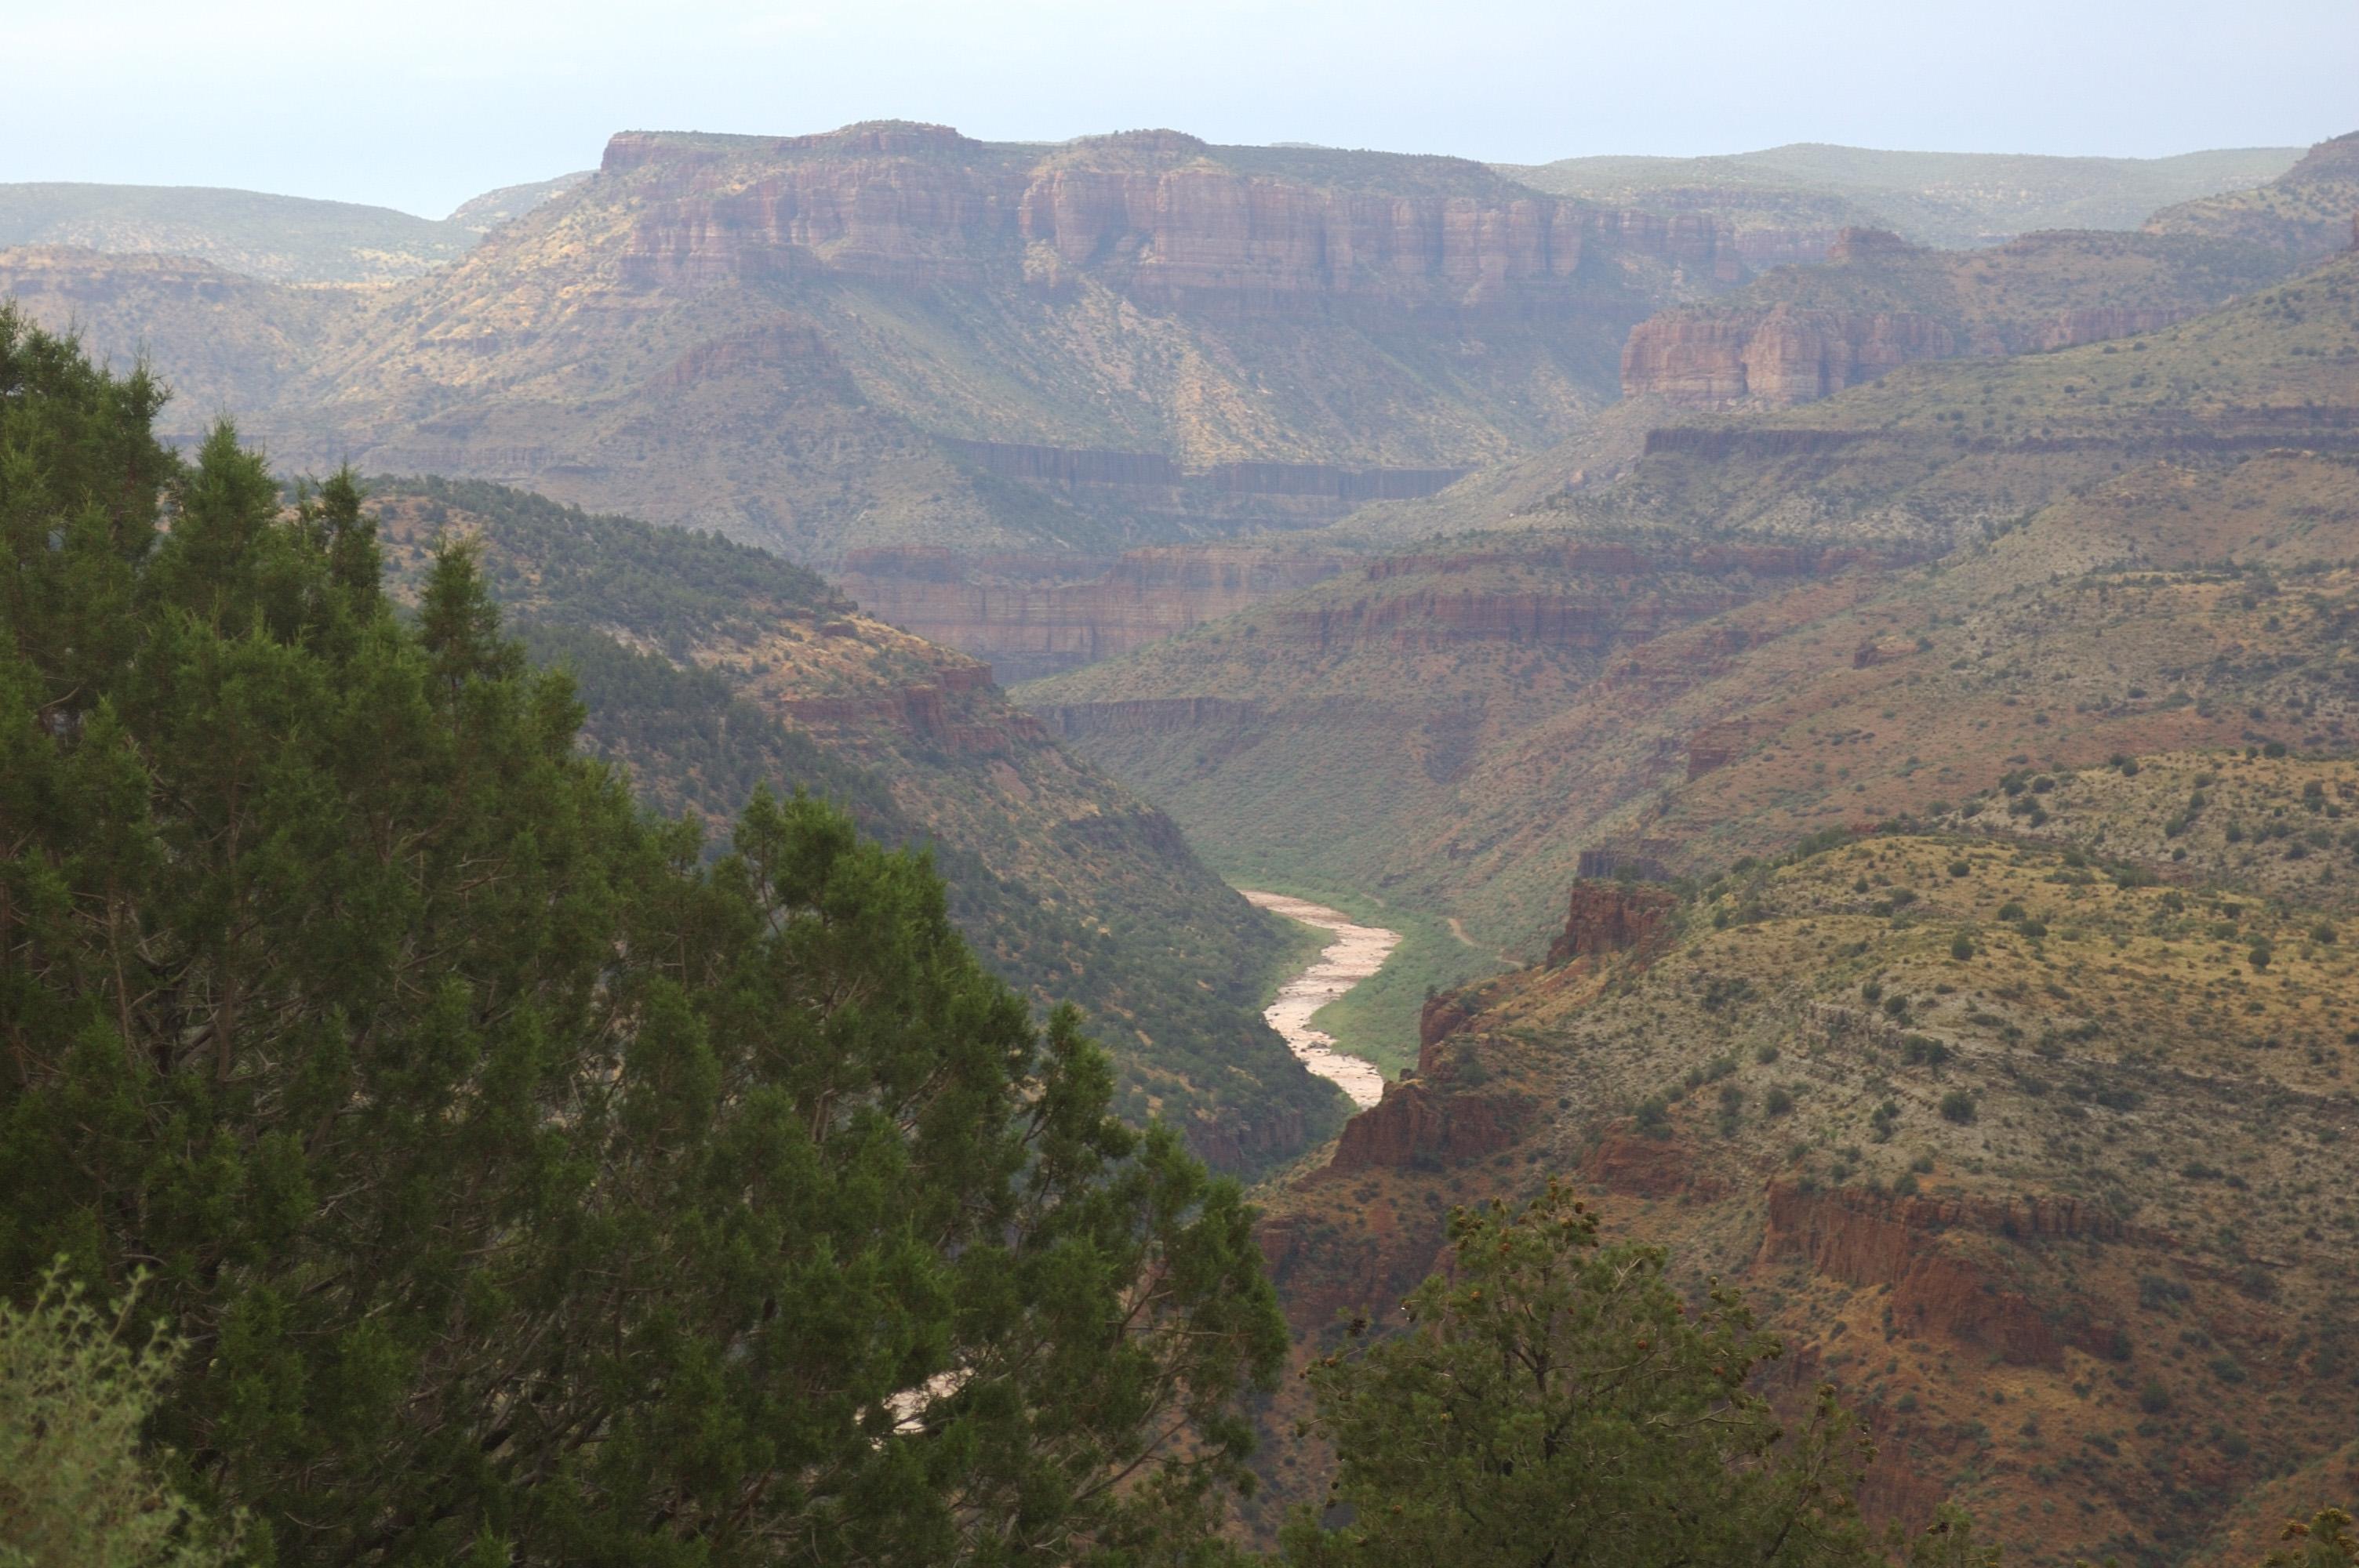 Arizona gila county young - Arizona 15fav Wow River Ilovenature Nikon Canyon Saltriver